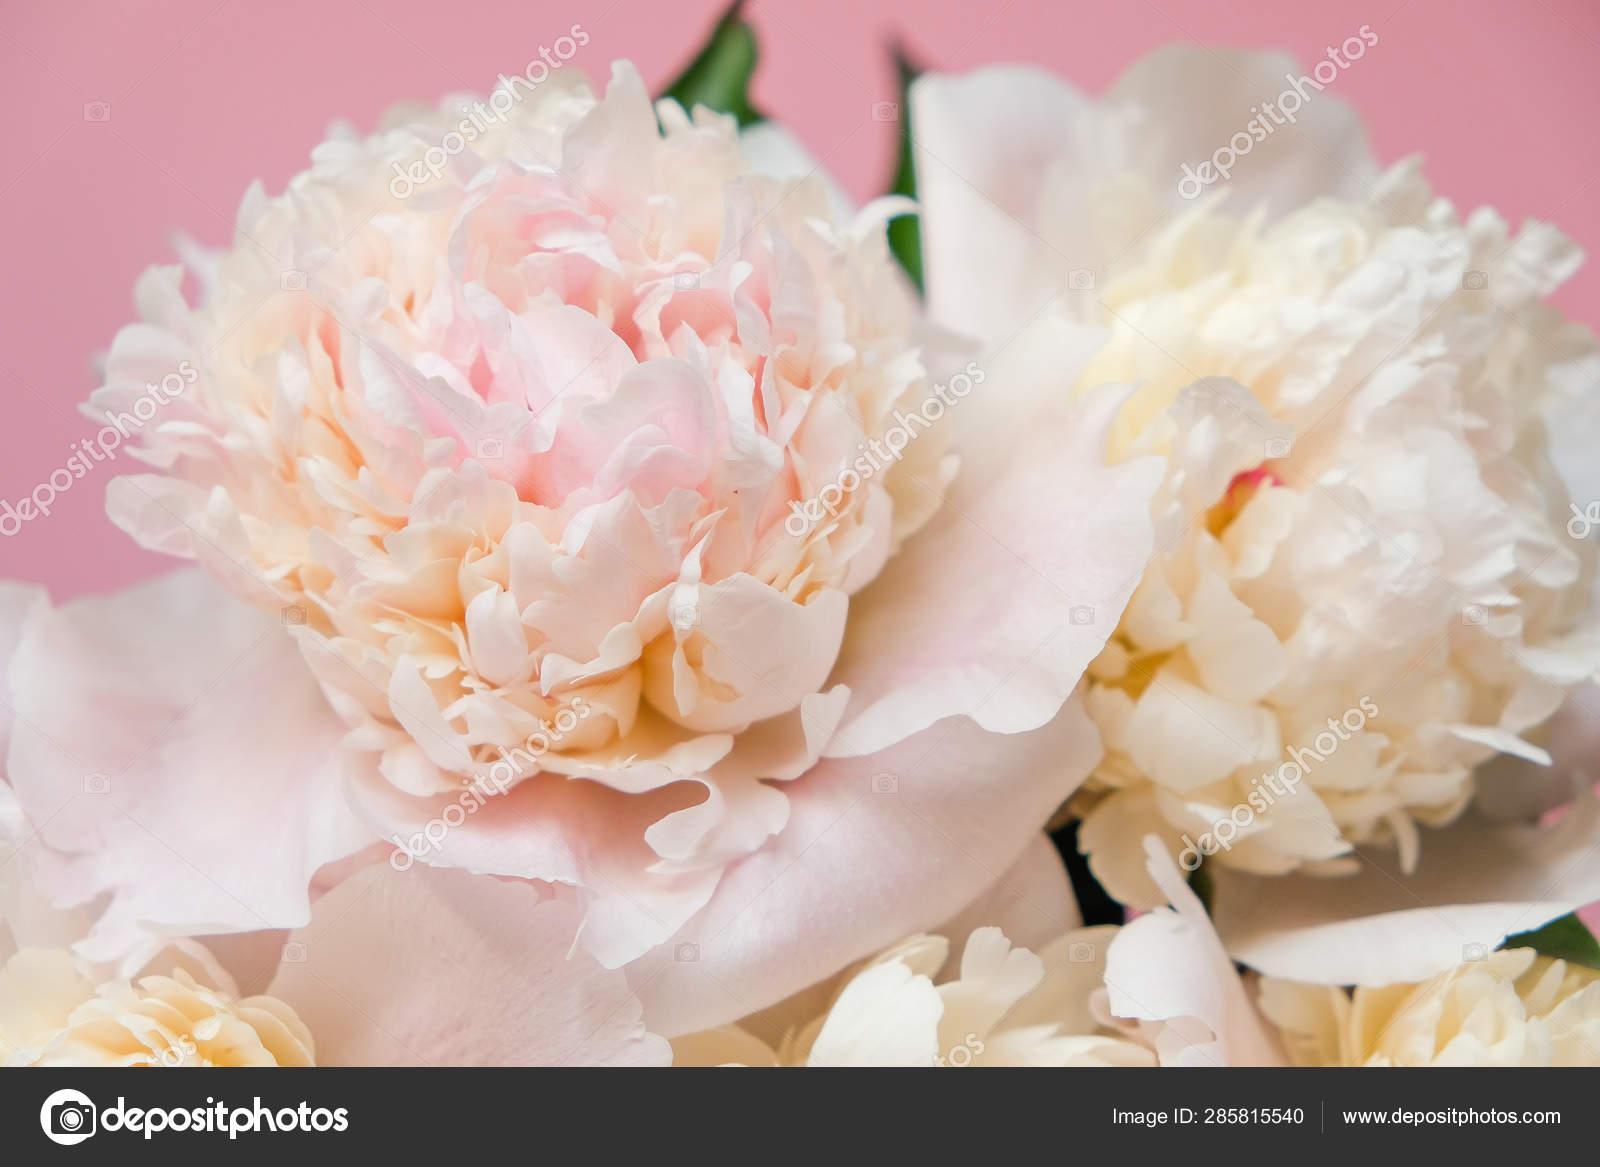 Beautiful White Peony Bouquet Close Up Stock Photo Image By C Photodiod Gmail Com 285815540